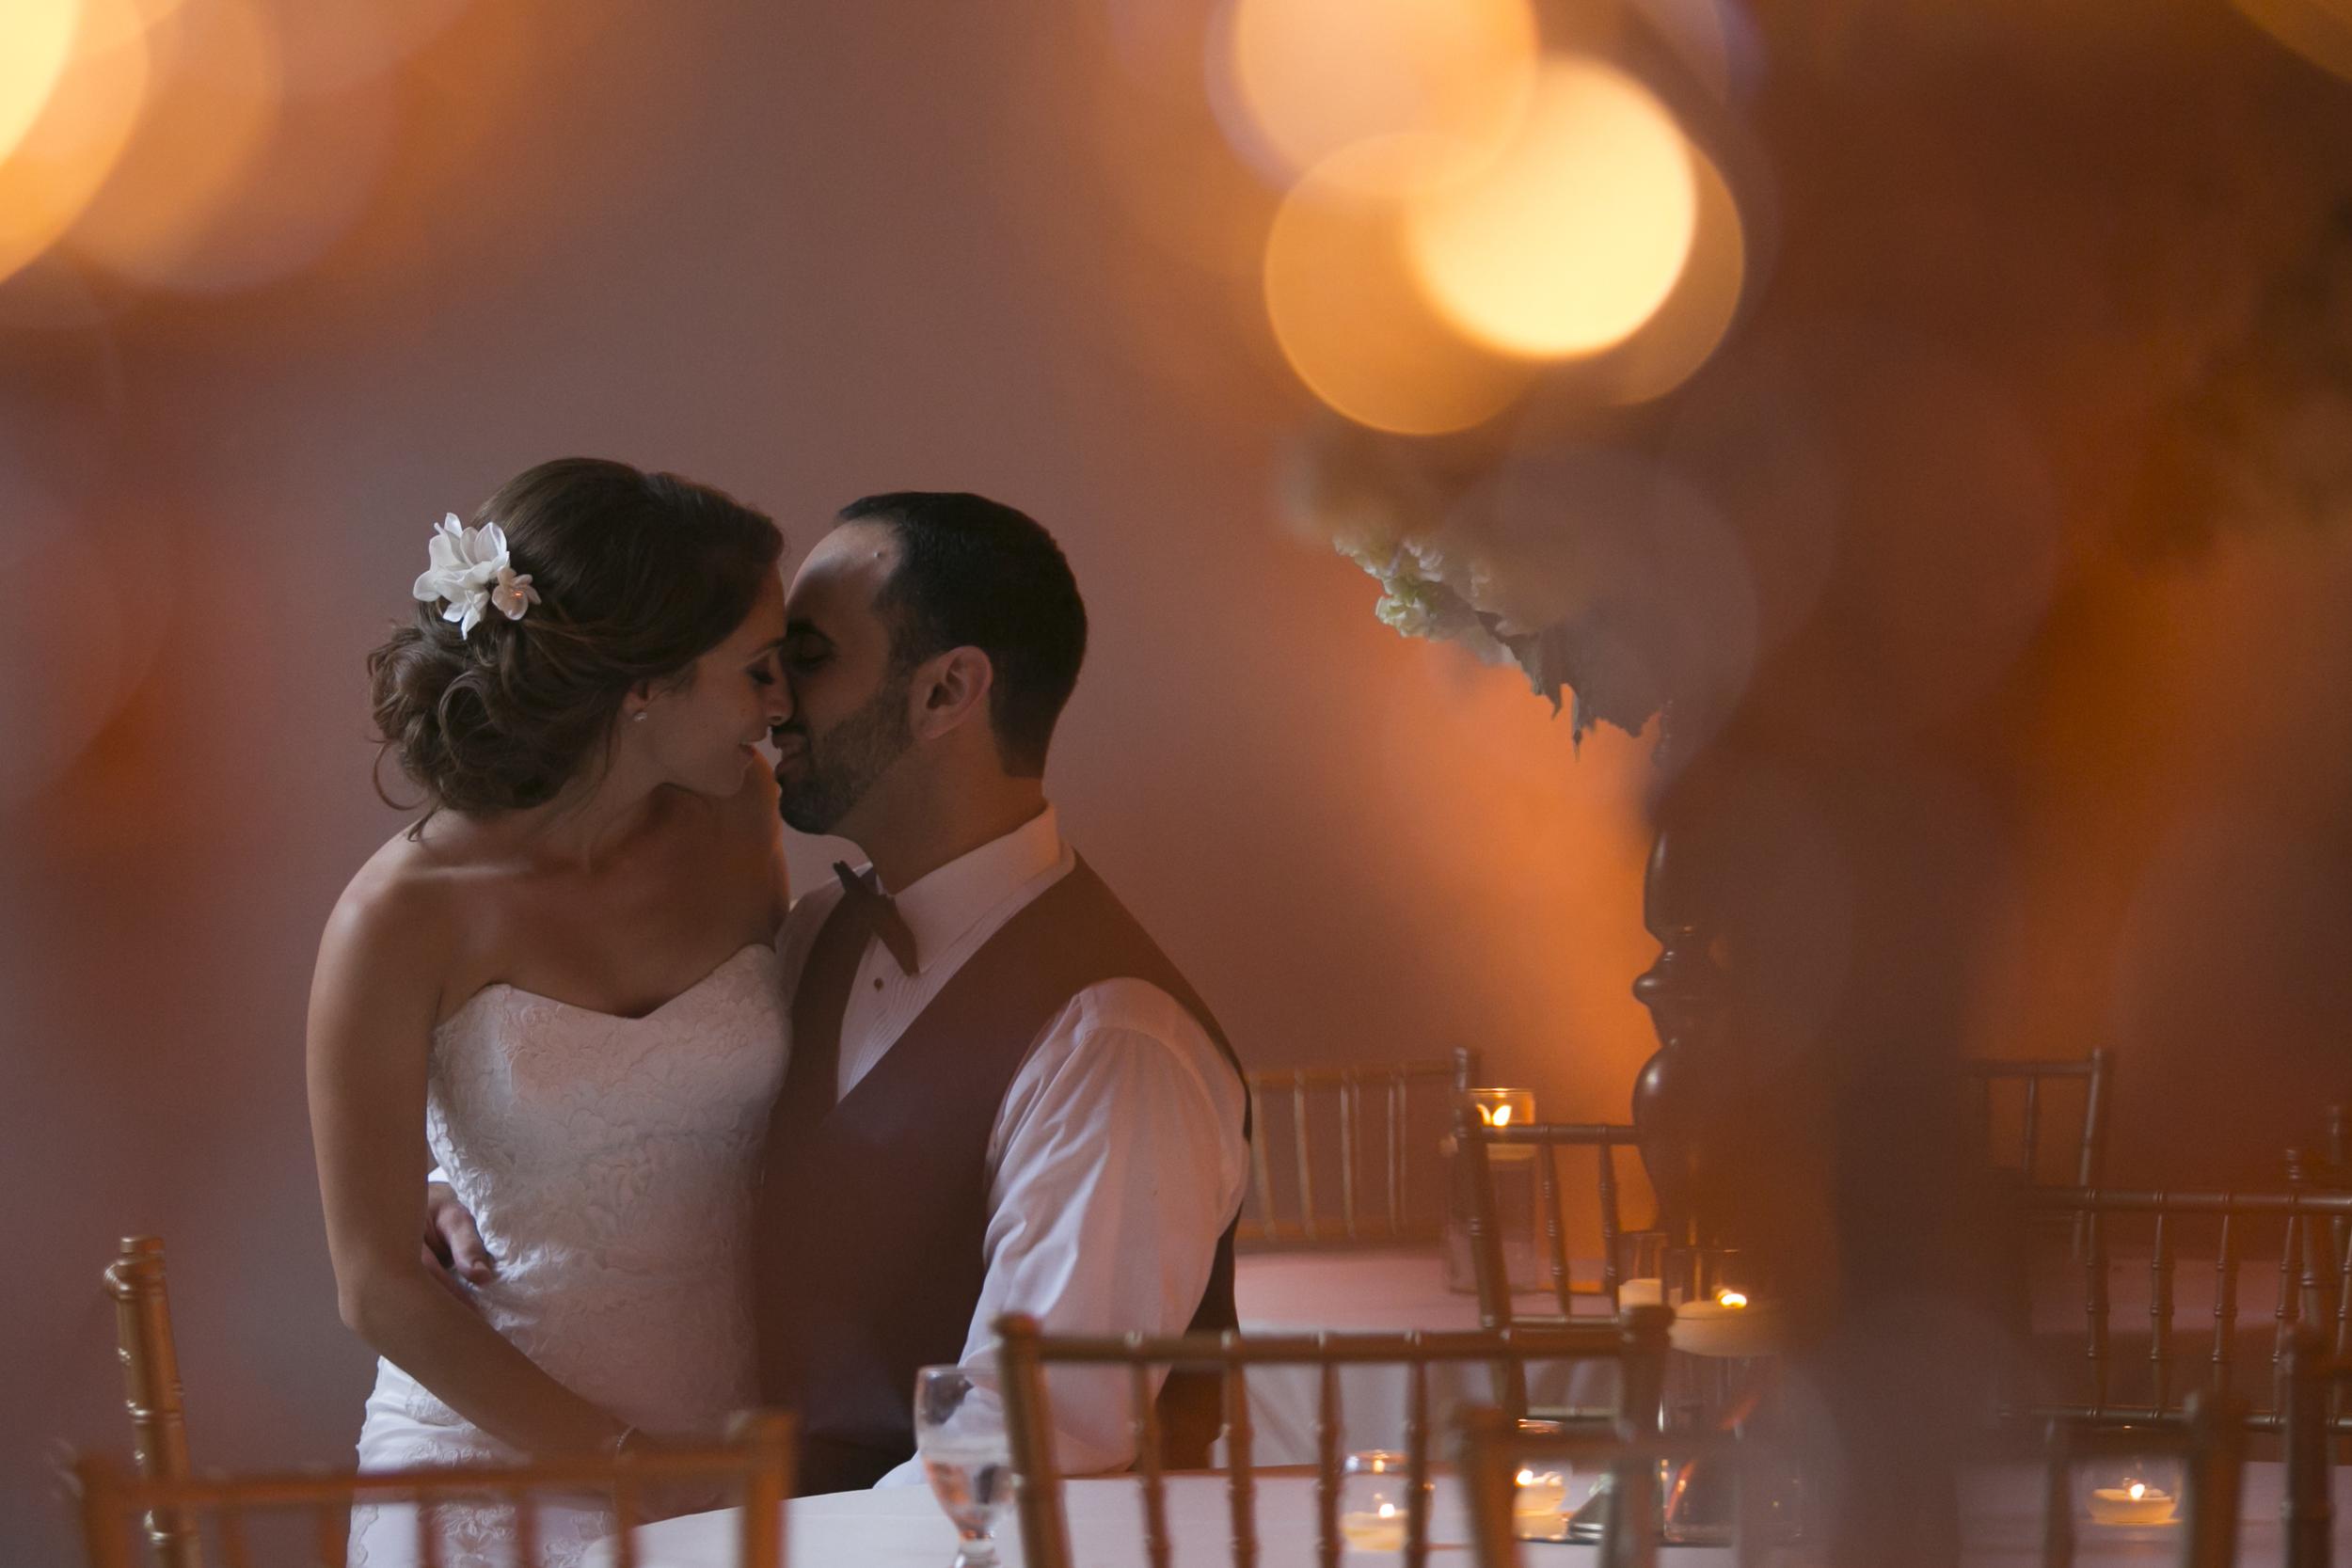 Persian Wedding-South San Francisco-Meo Baaklini35.jpg